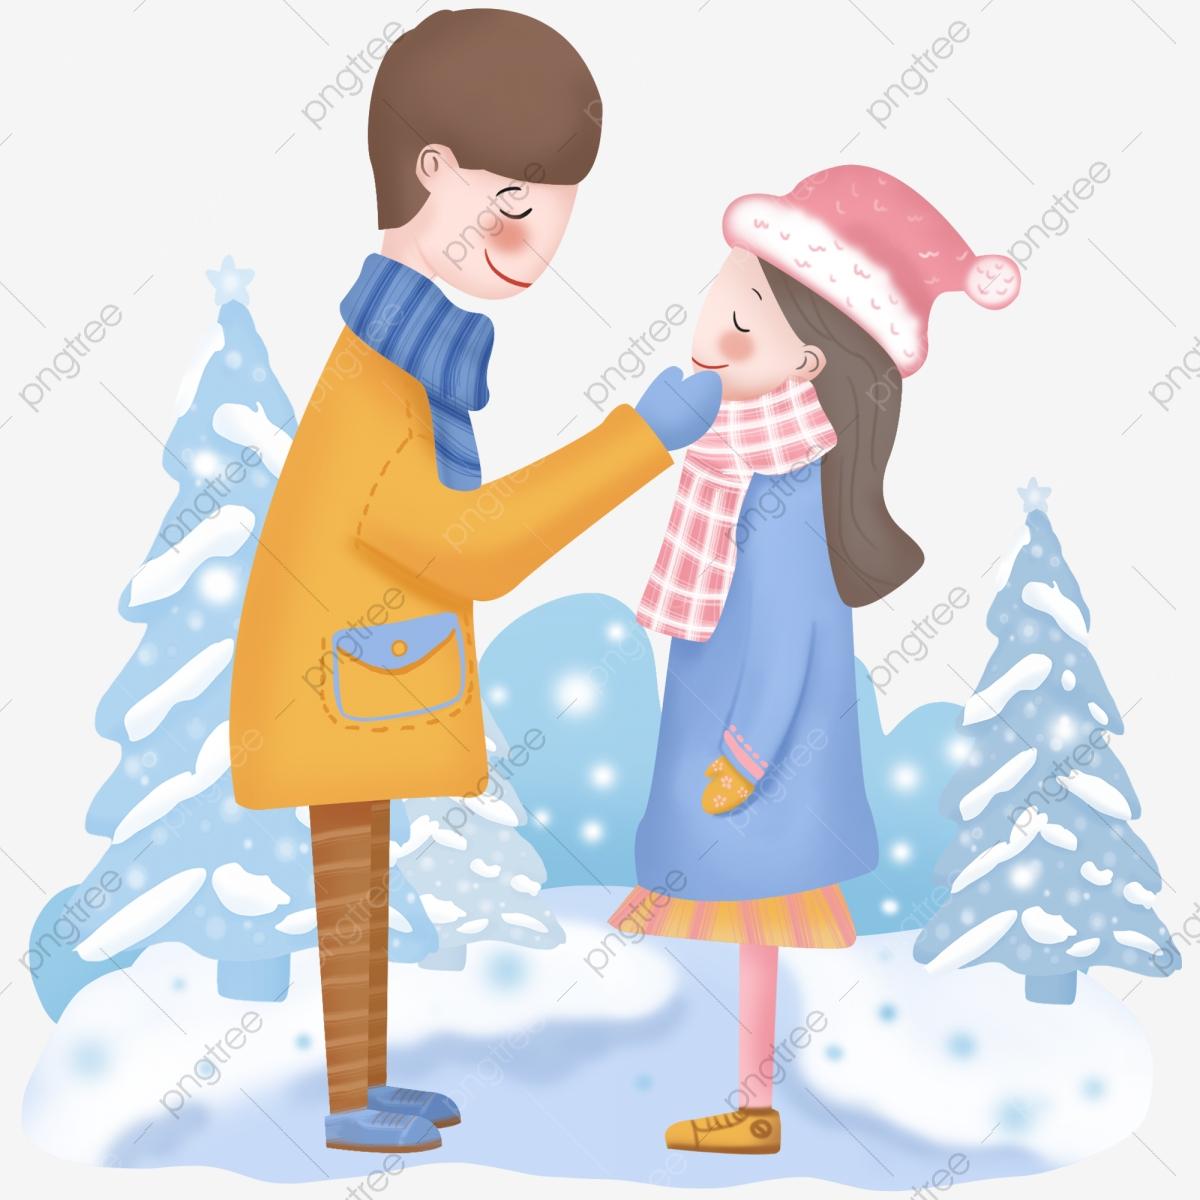 Winter clipart couple. Hand drawn cartoon scene